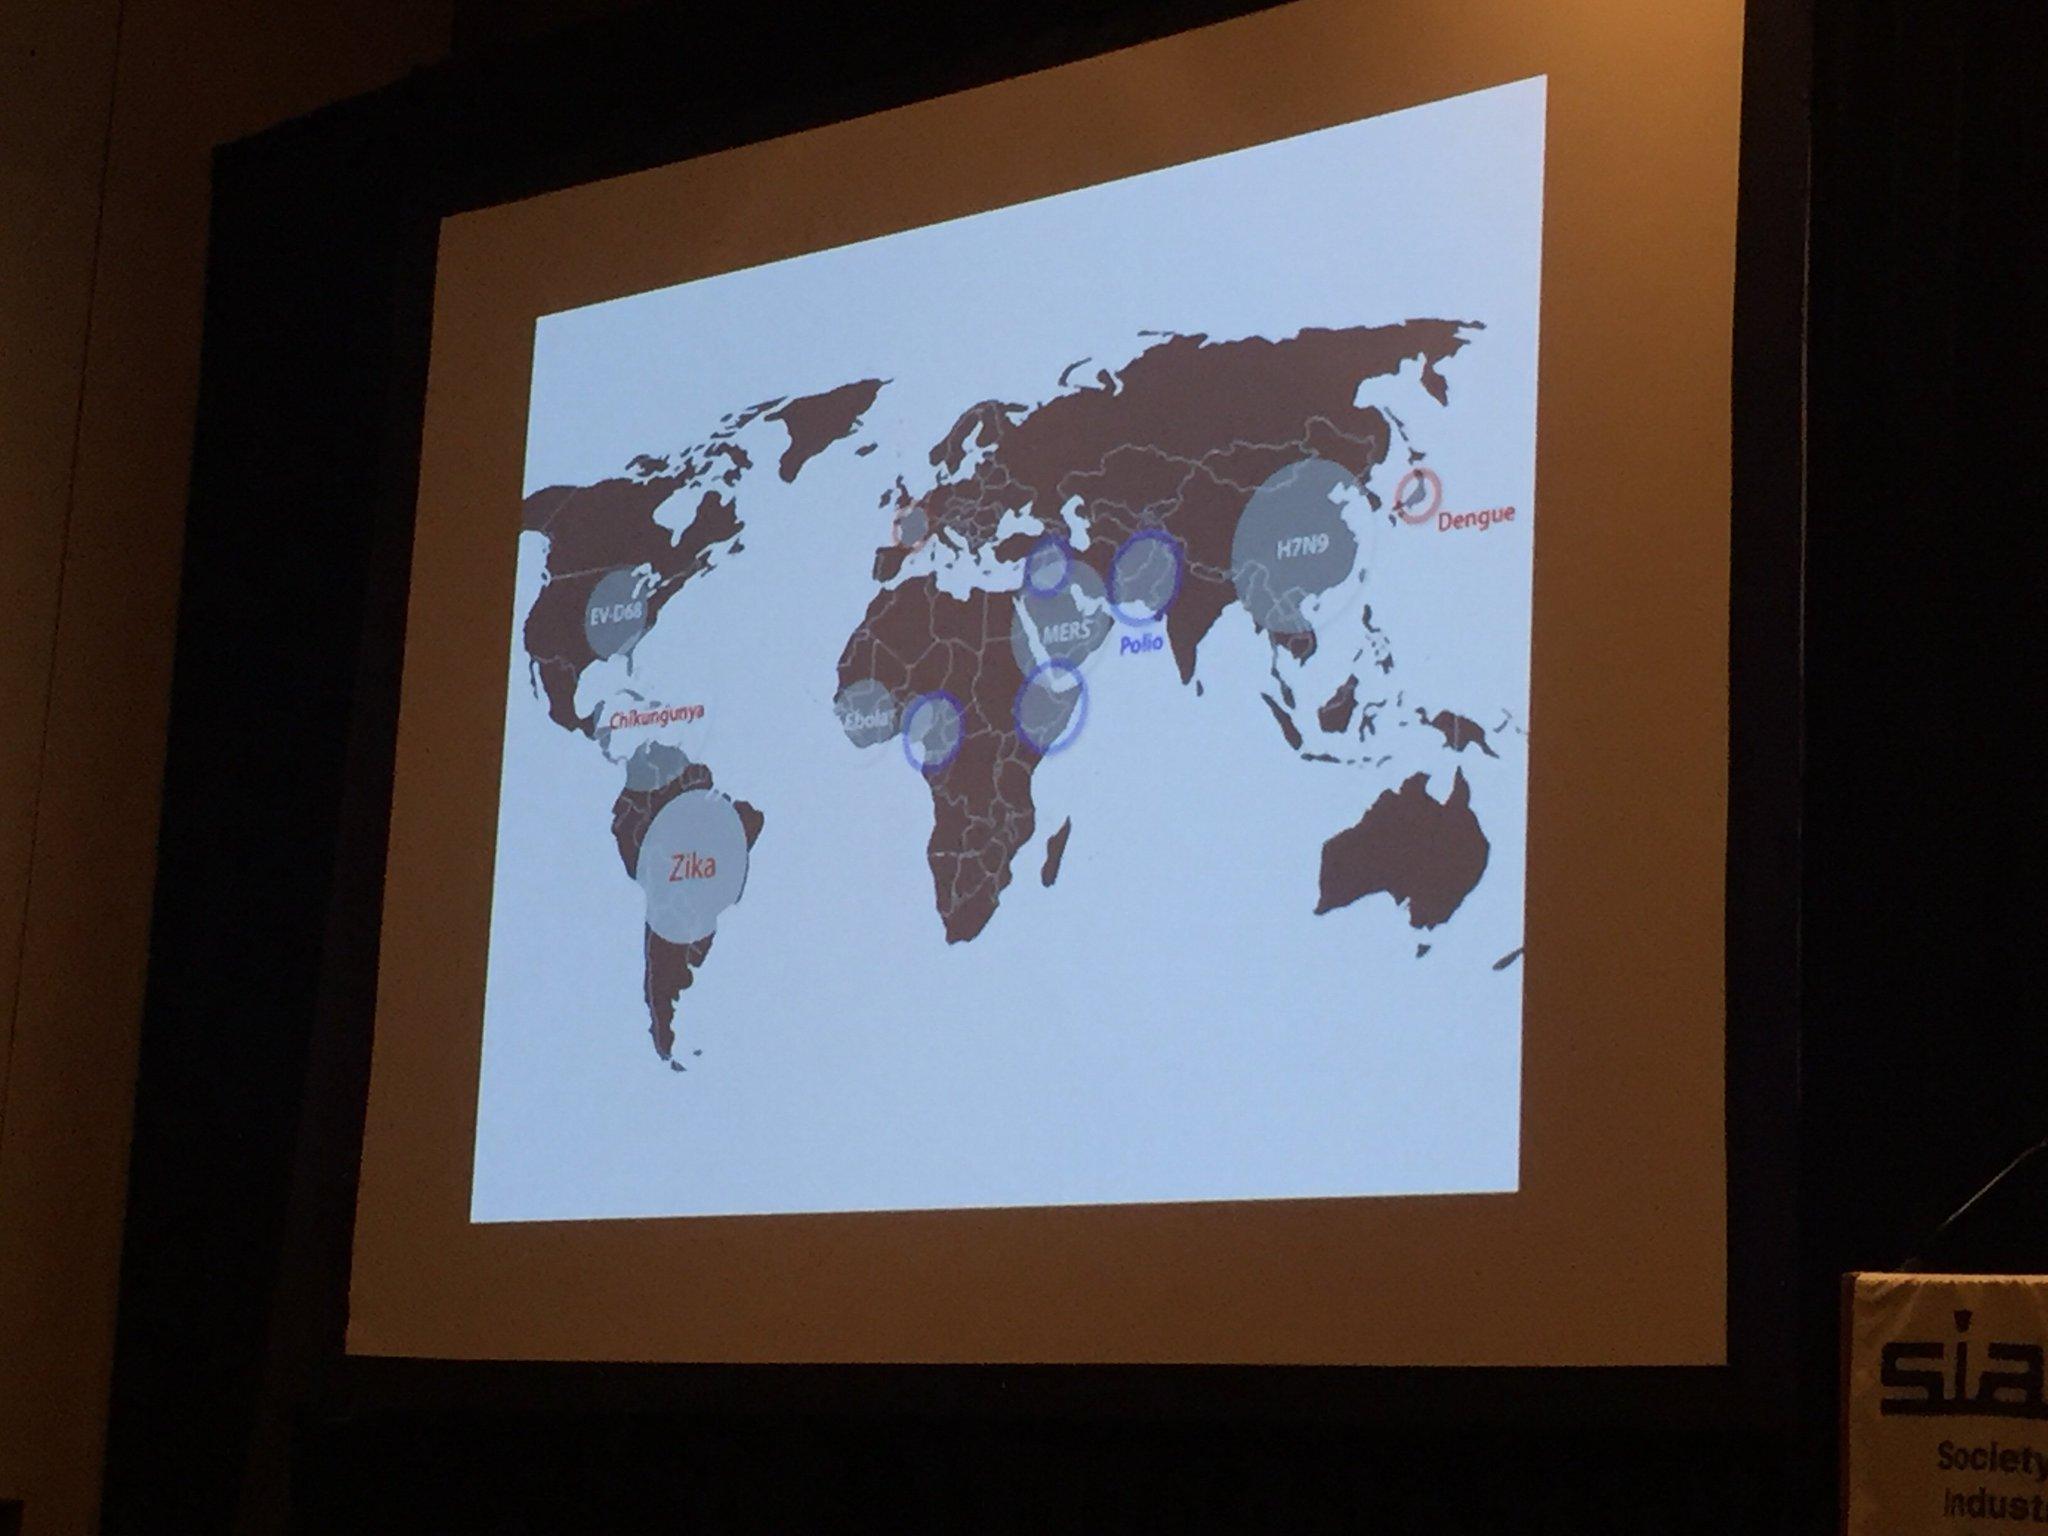 Many #epidemics in the last few years. #MERS invited talk #SIAMAN16 #siamls16 https://t.co/7PGpuQlunu